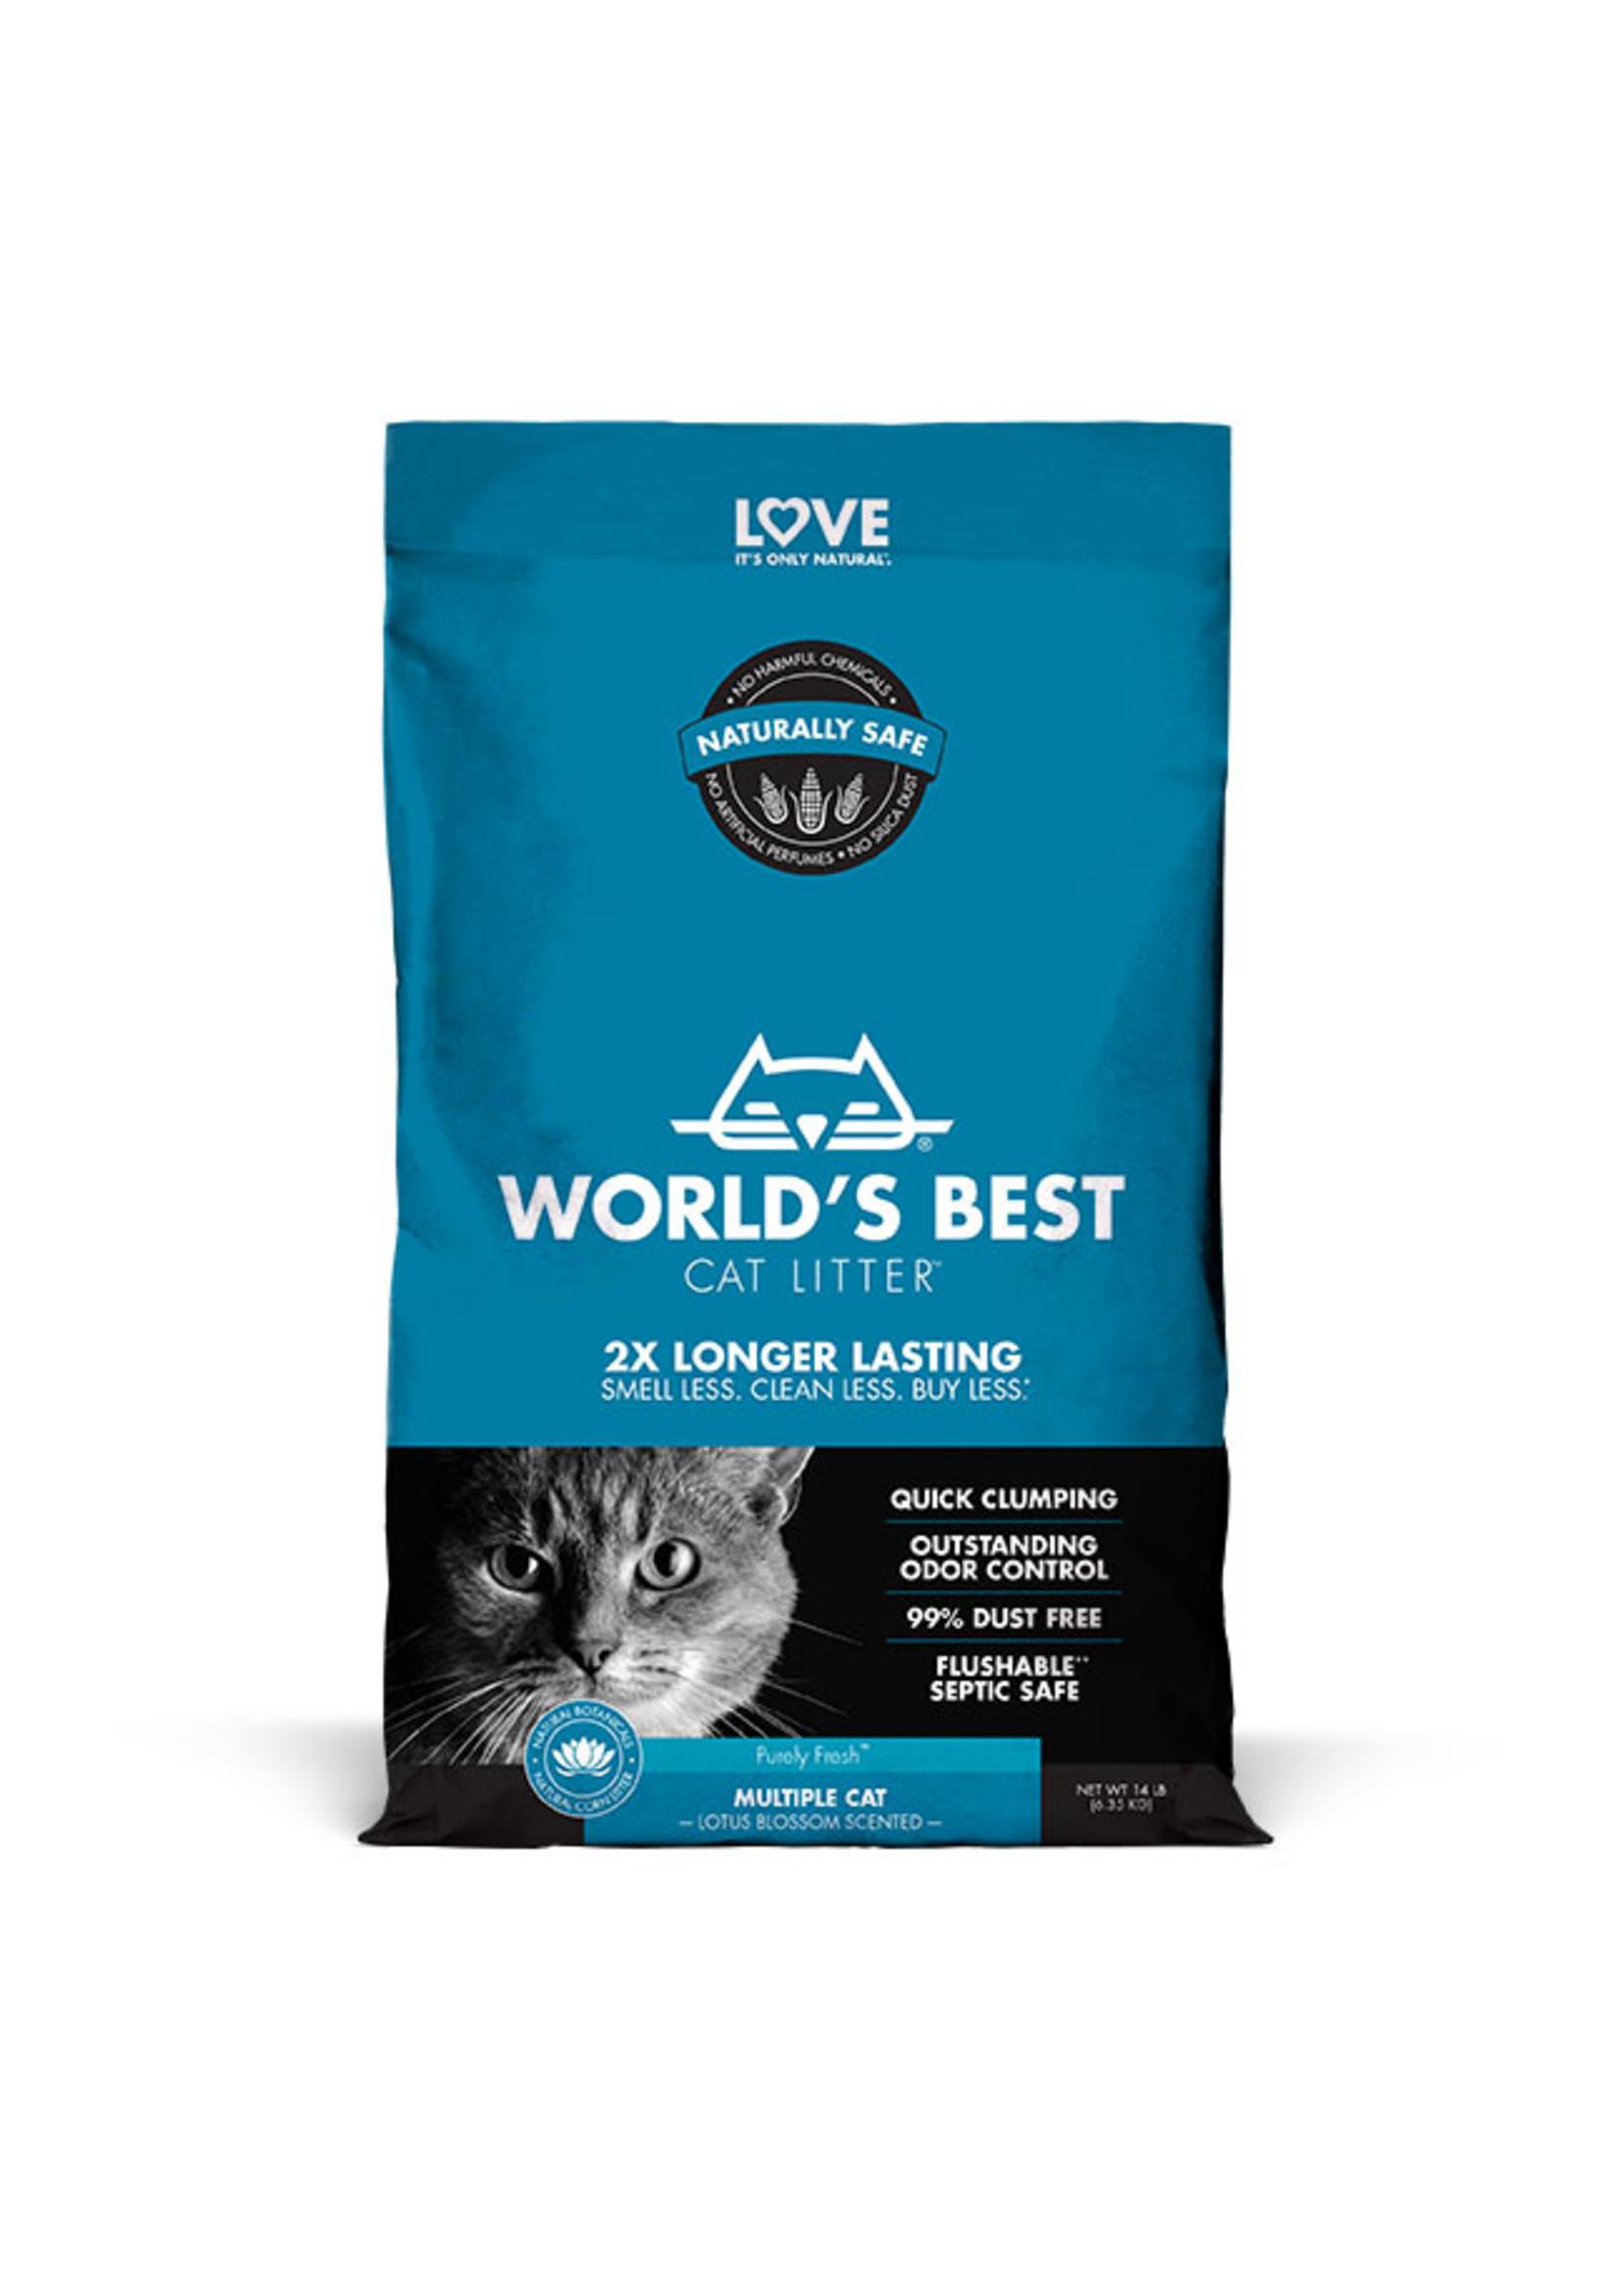 World's Best Cat Litter World's Best Cat Litter Multiple Cat Lotus Blossom